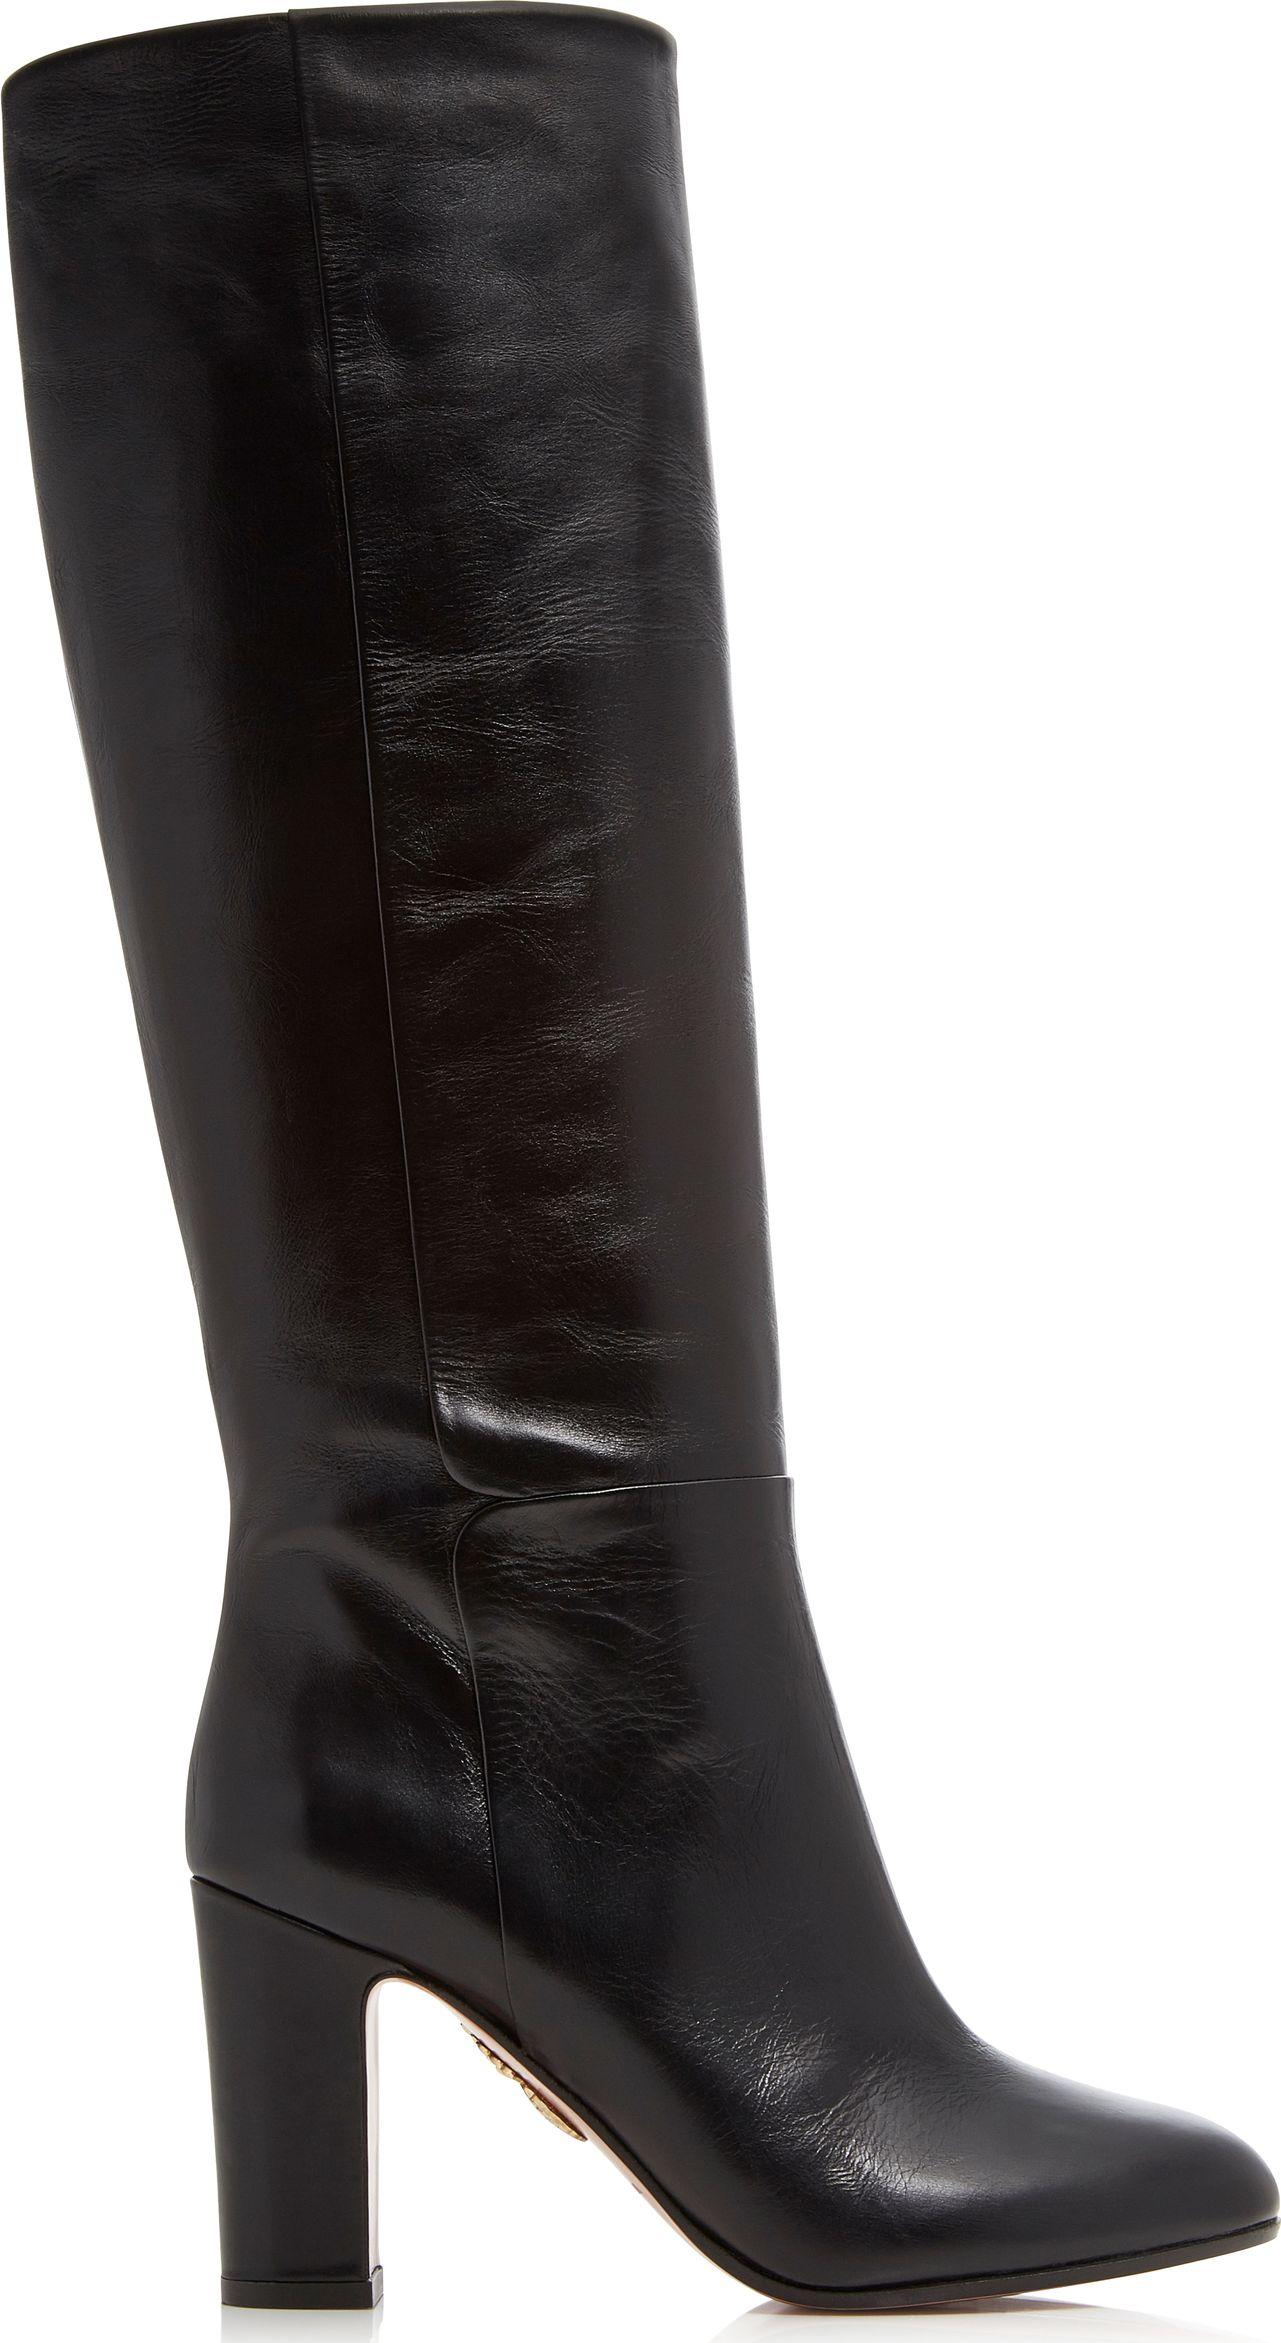 Aquazzura - Brera Leather Boots